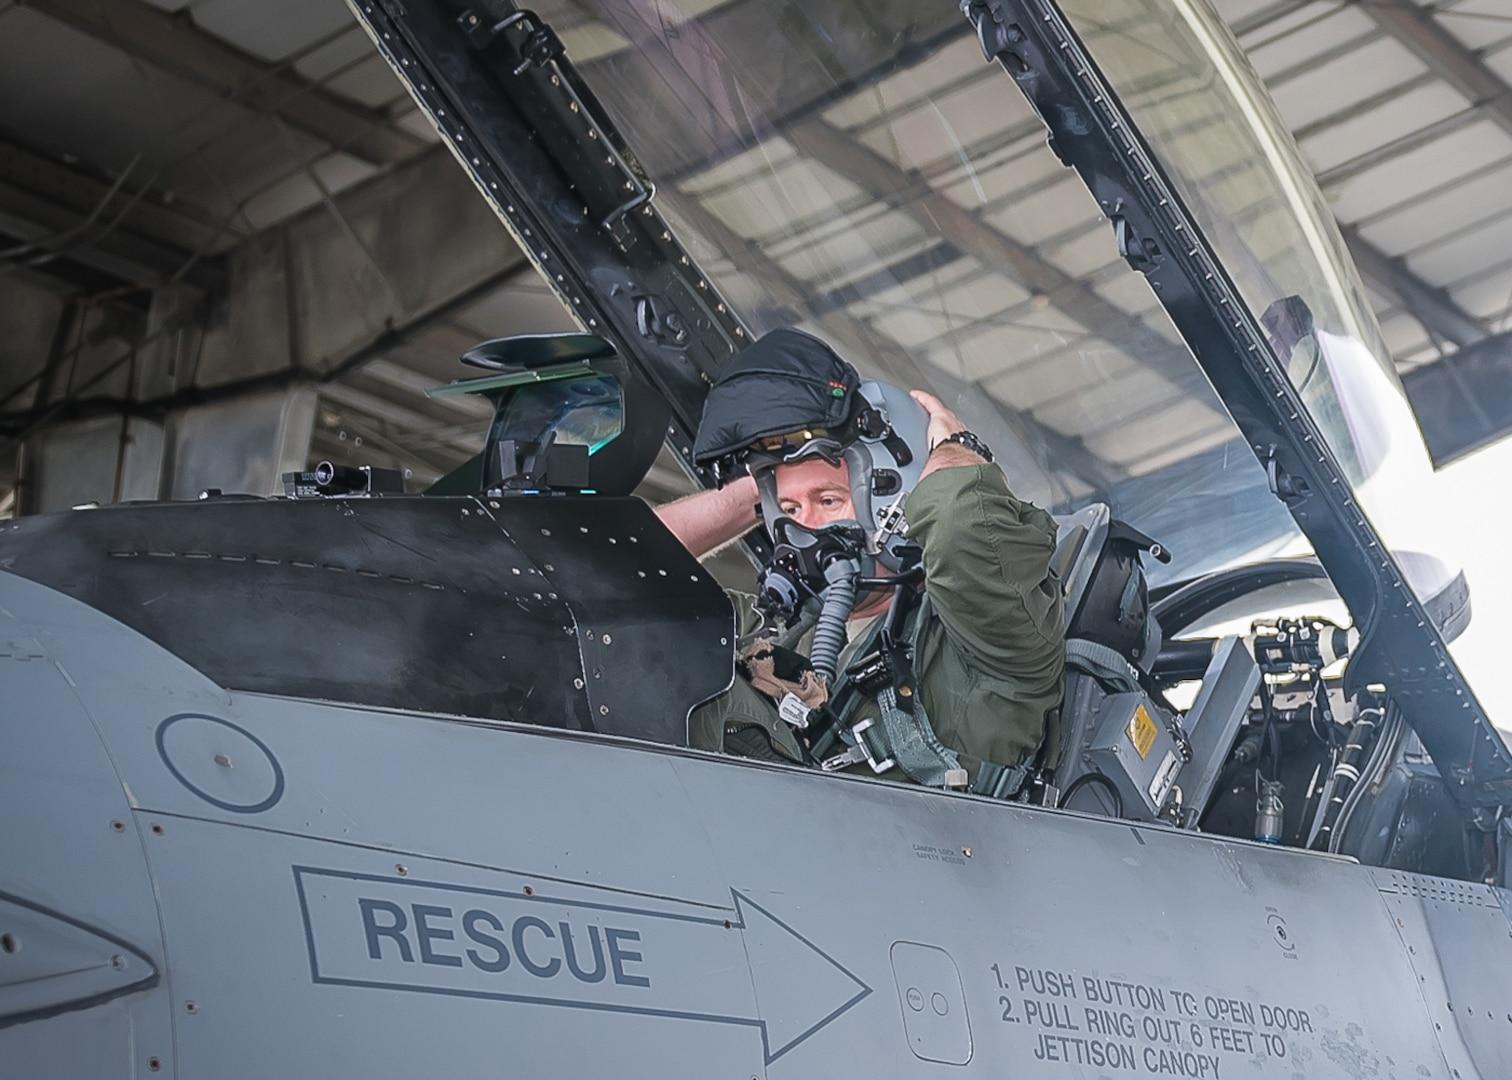 Tulsa Air National Guard Alert Mission (U.S. Air National Guard Photo by Master Sgt. C.T. Michael)